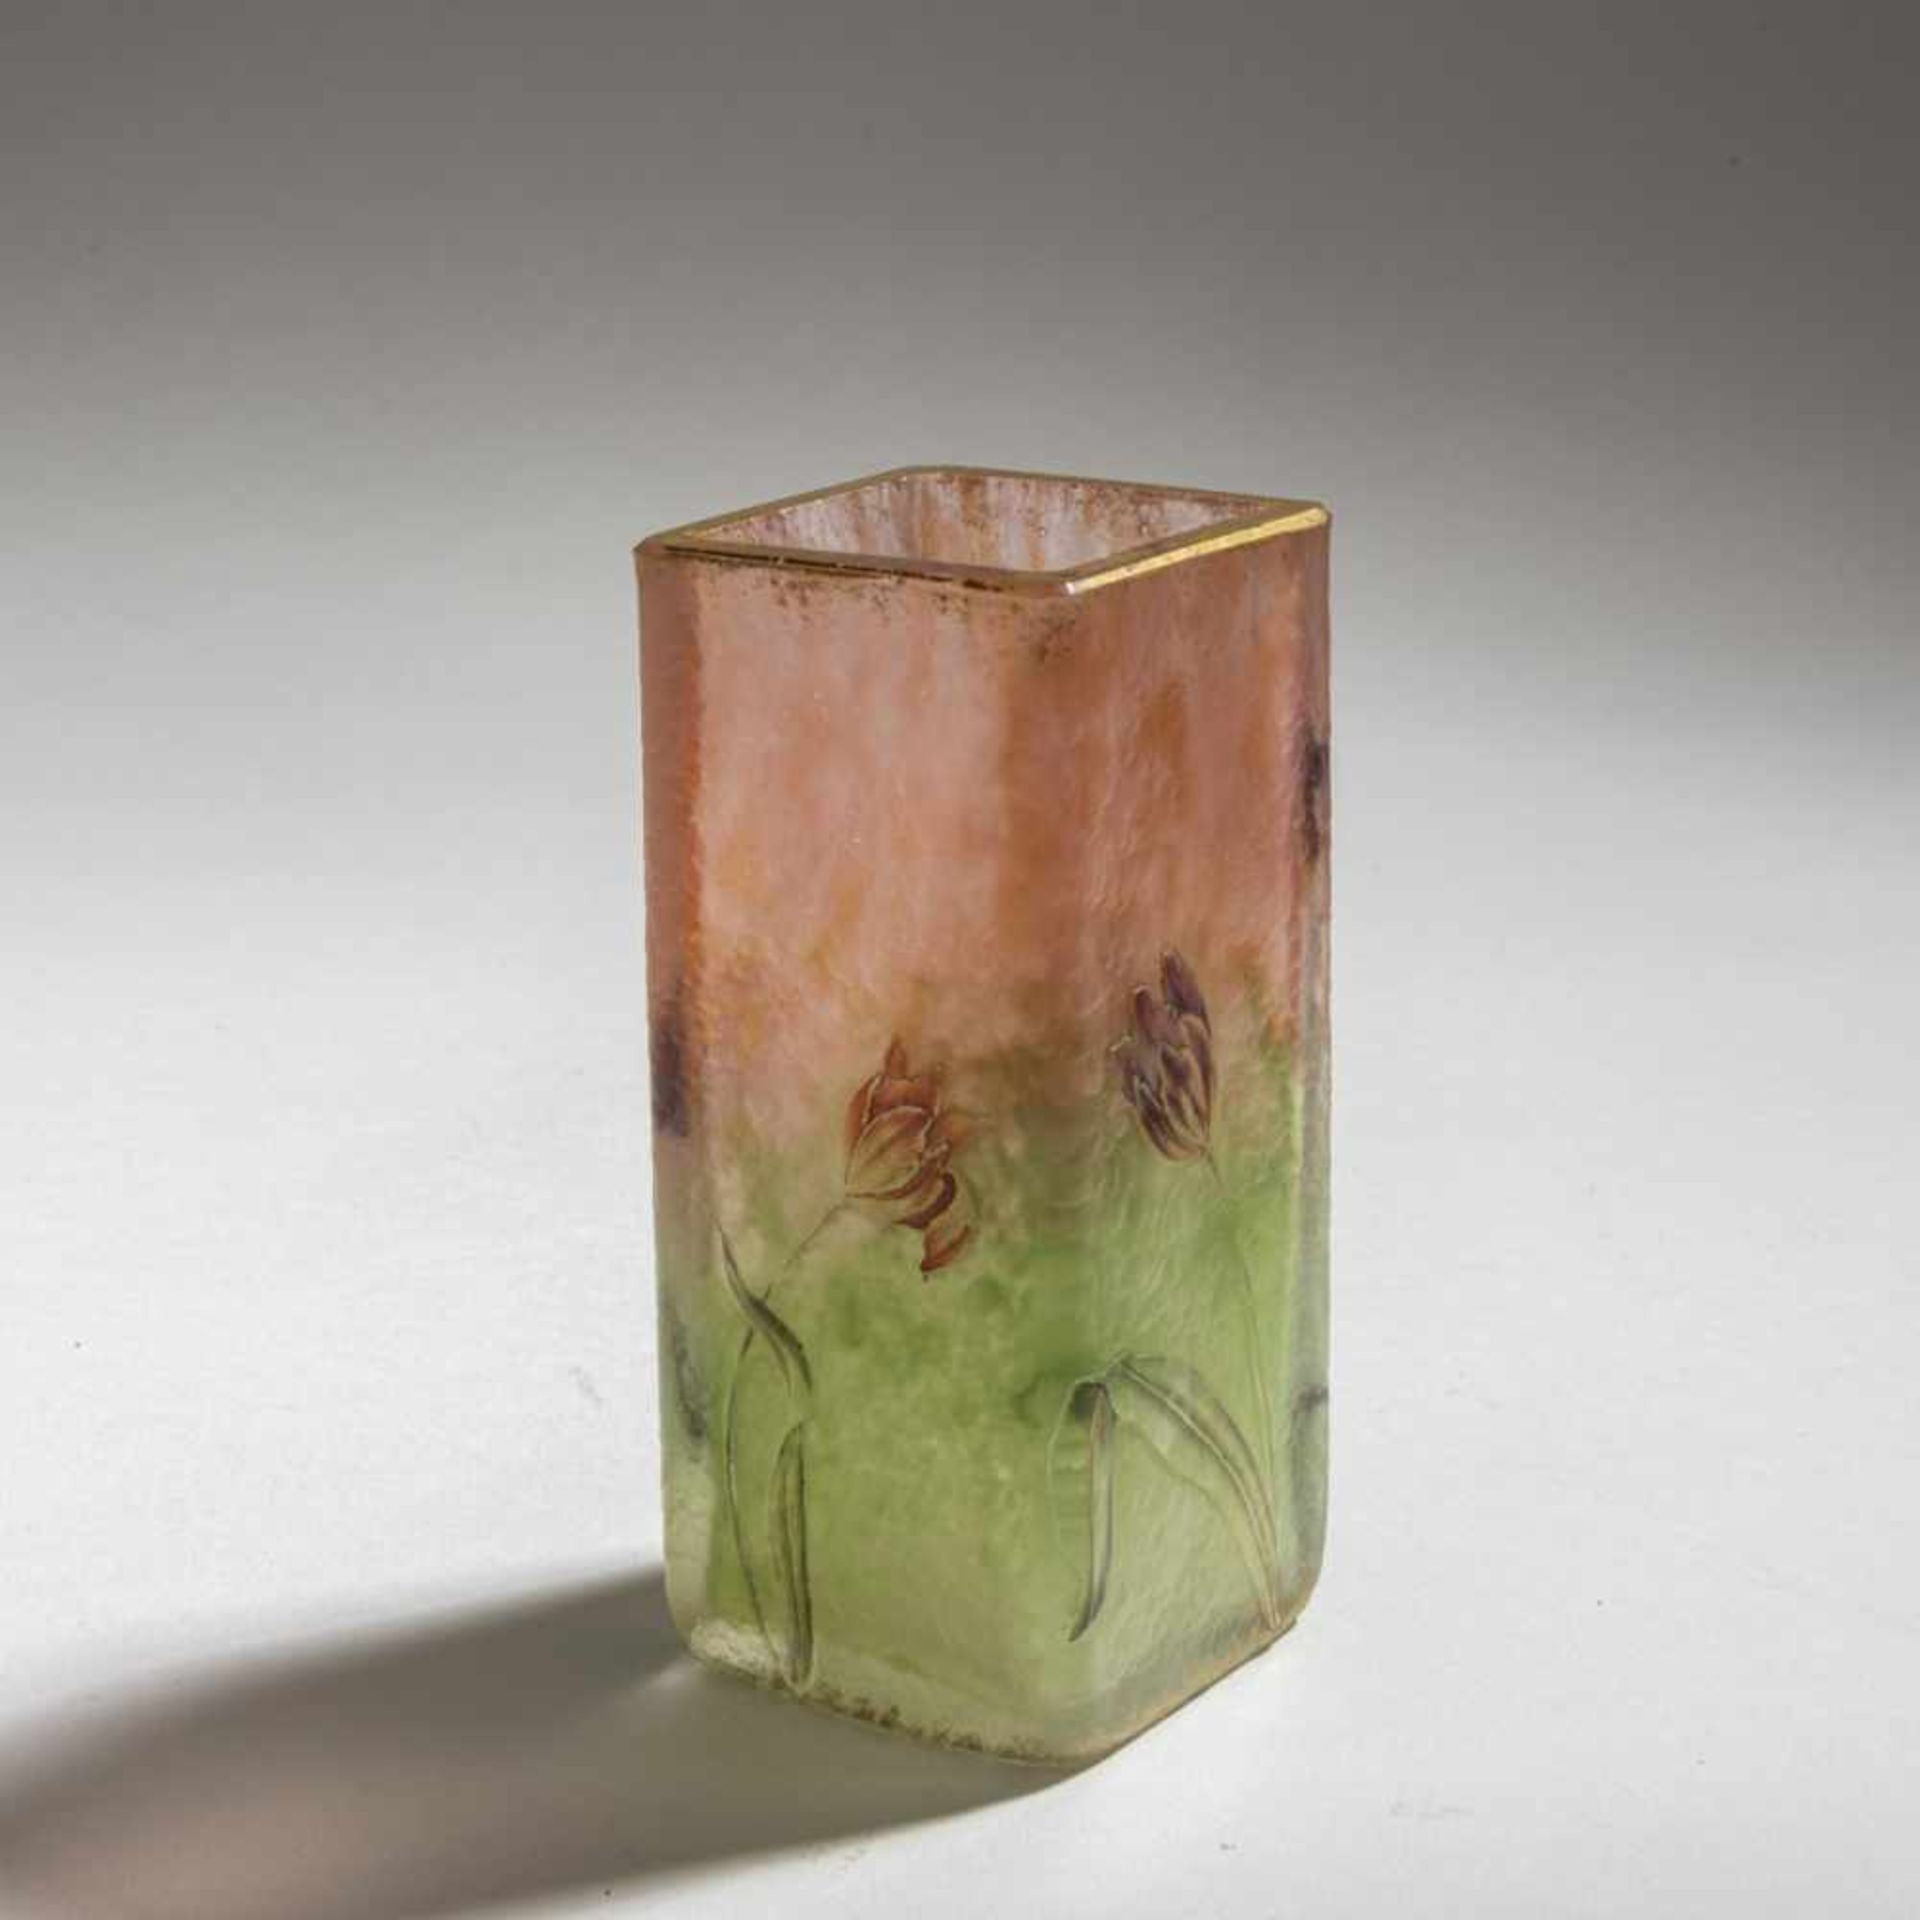 Los 124 - Daum Frères, Nancy , Vase 'Tulipes', um 1900Vase 'Tulipes', um 1900H. 12 cm. Überfangglas,...